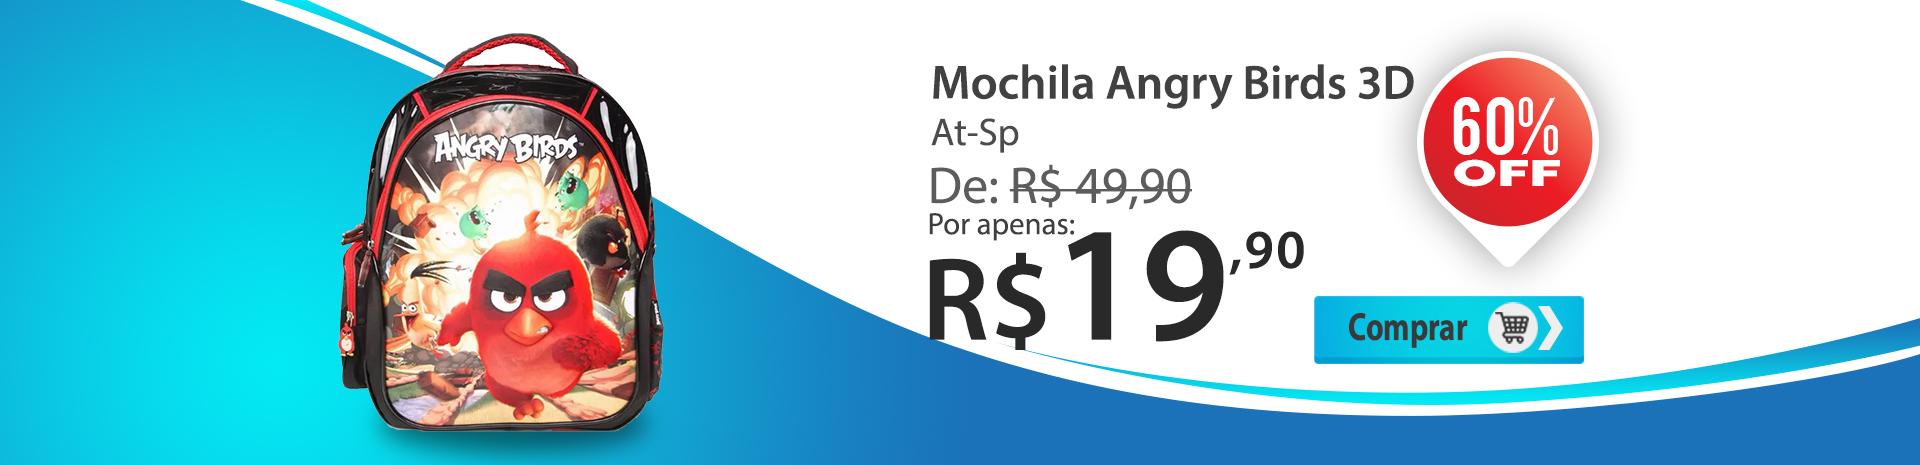 banner categoria mochila angry